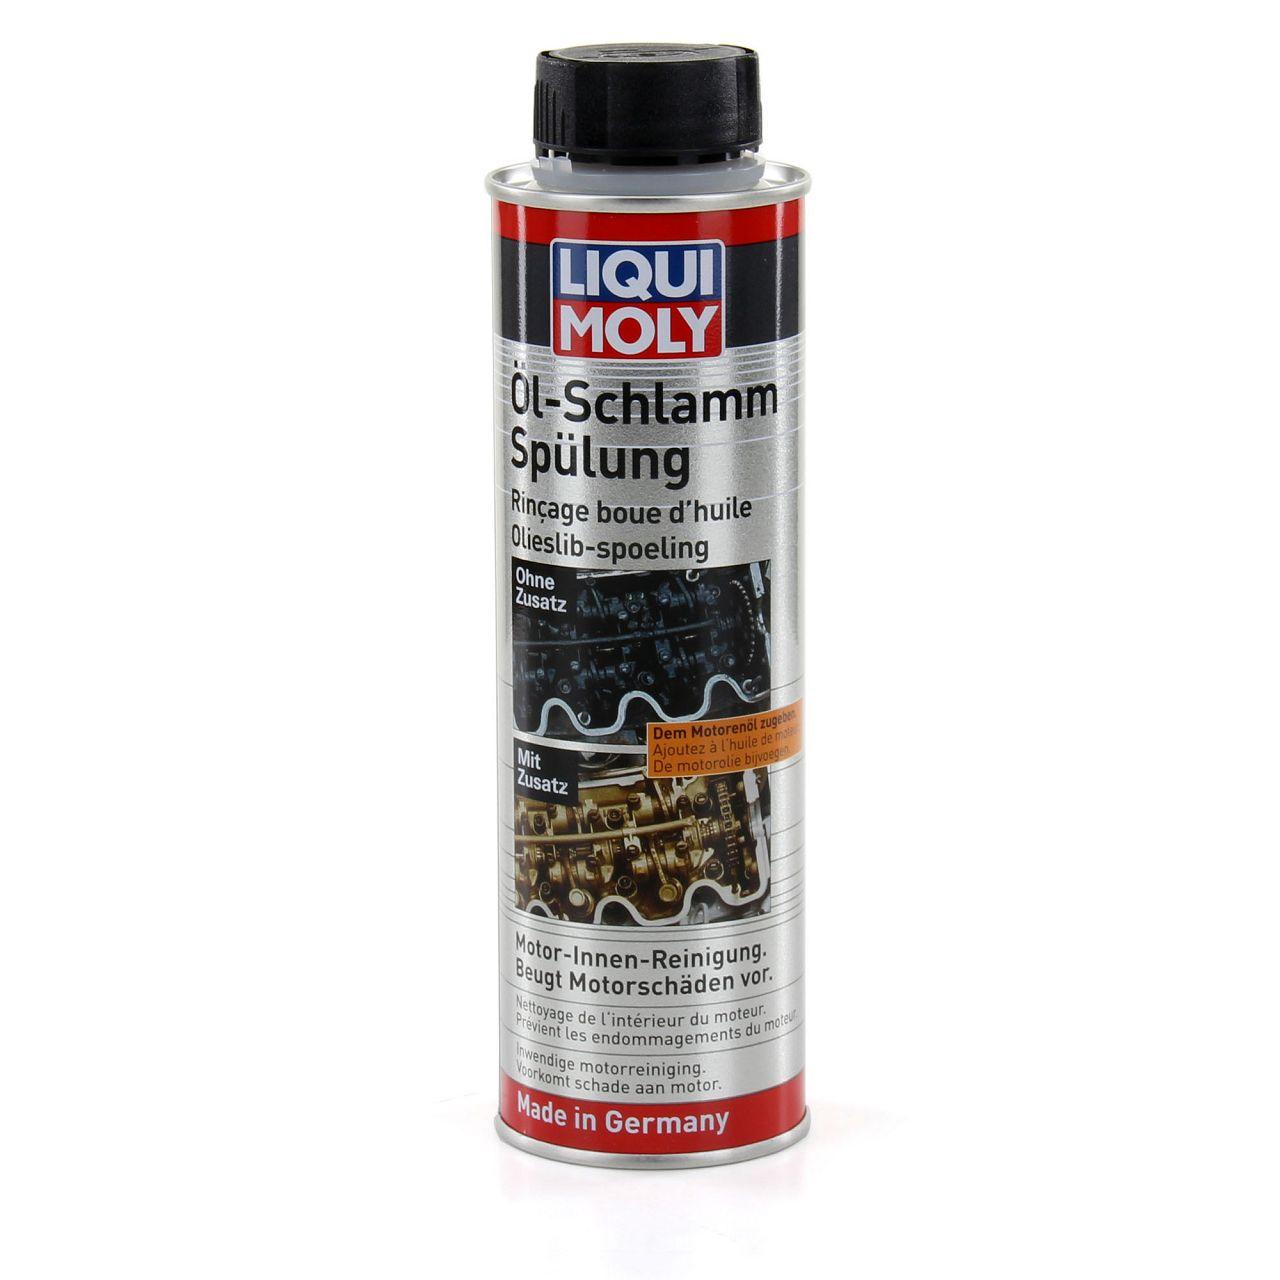 LIQUI MOLY Ölschlamm Spülung Motor Reiniger Motorspülung Additiv 300 ml 5200